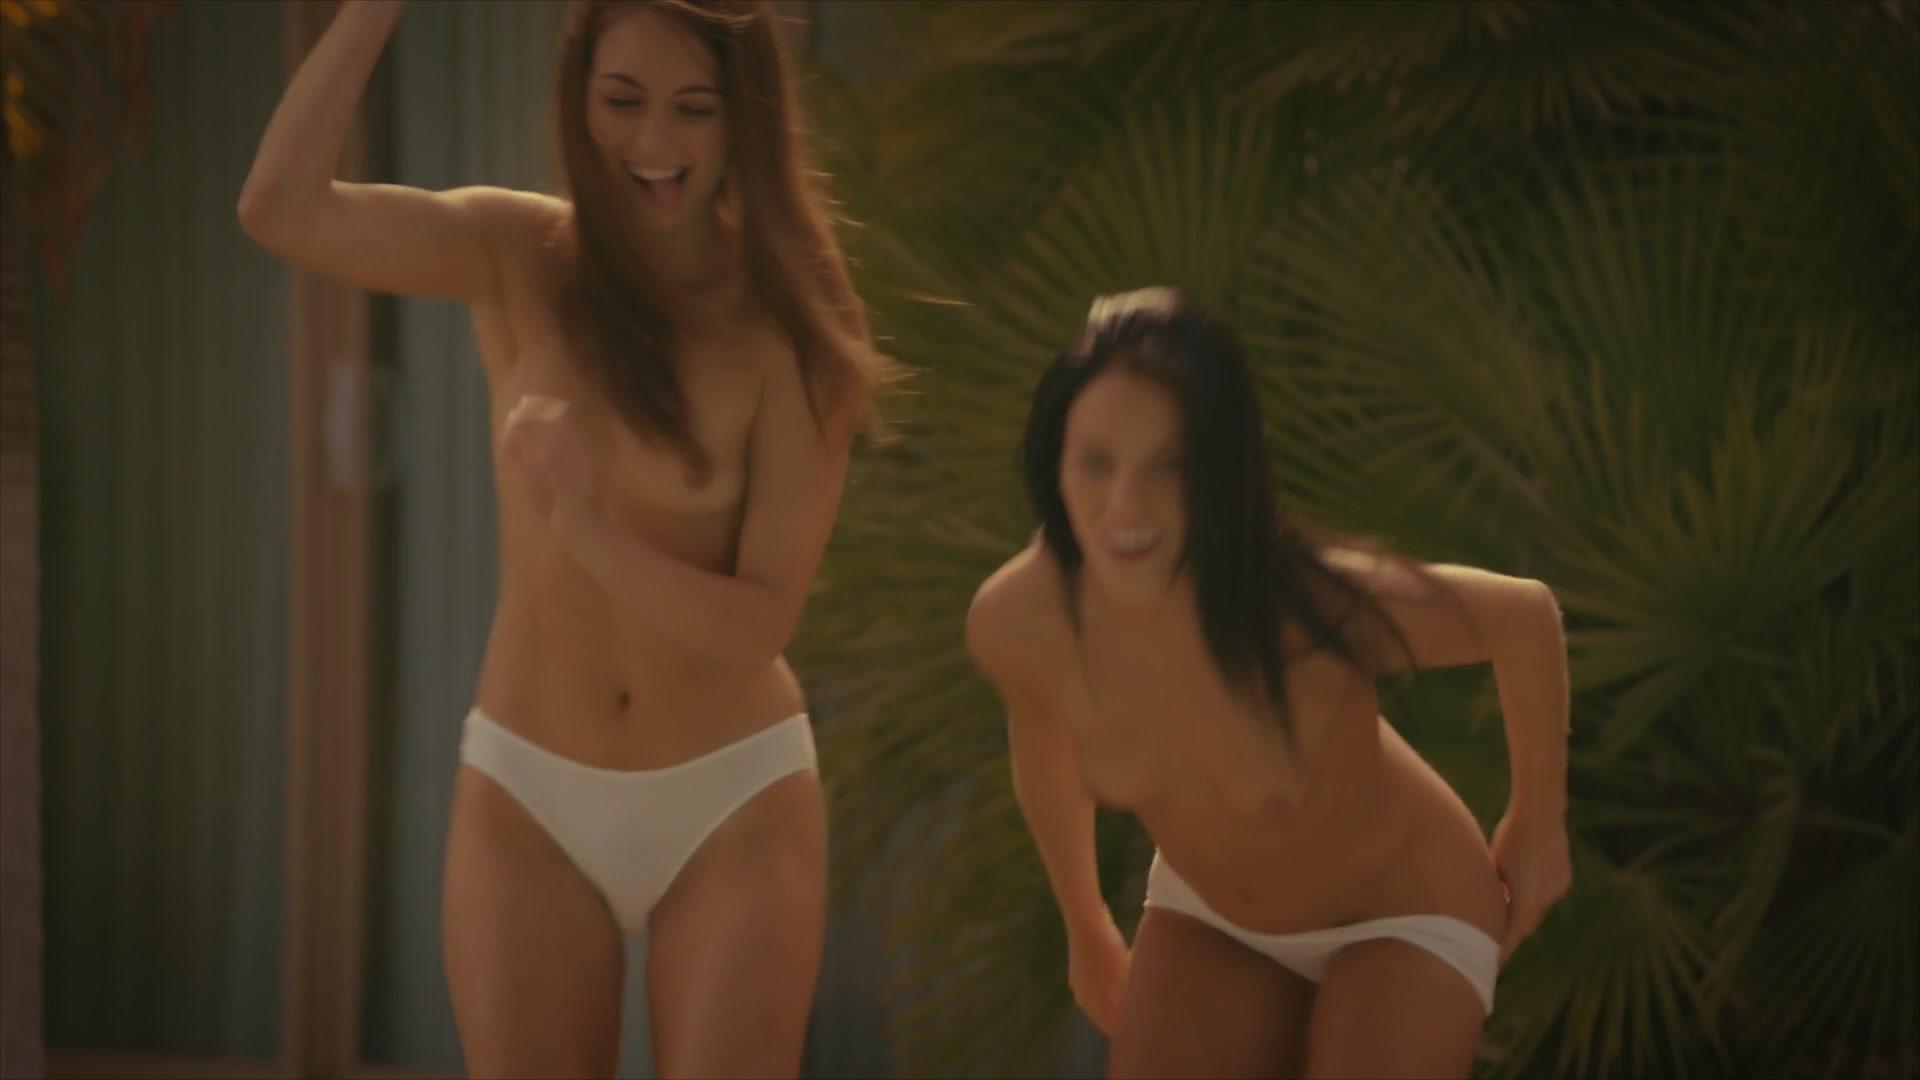 Hot porno Ropa lactancia materna online dating